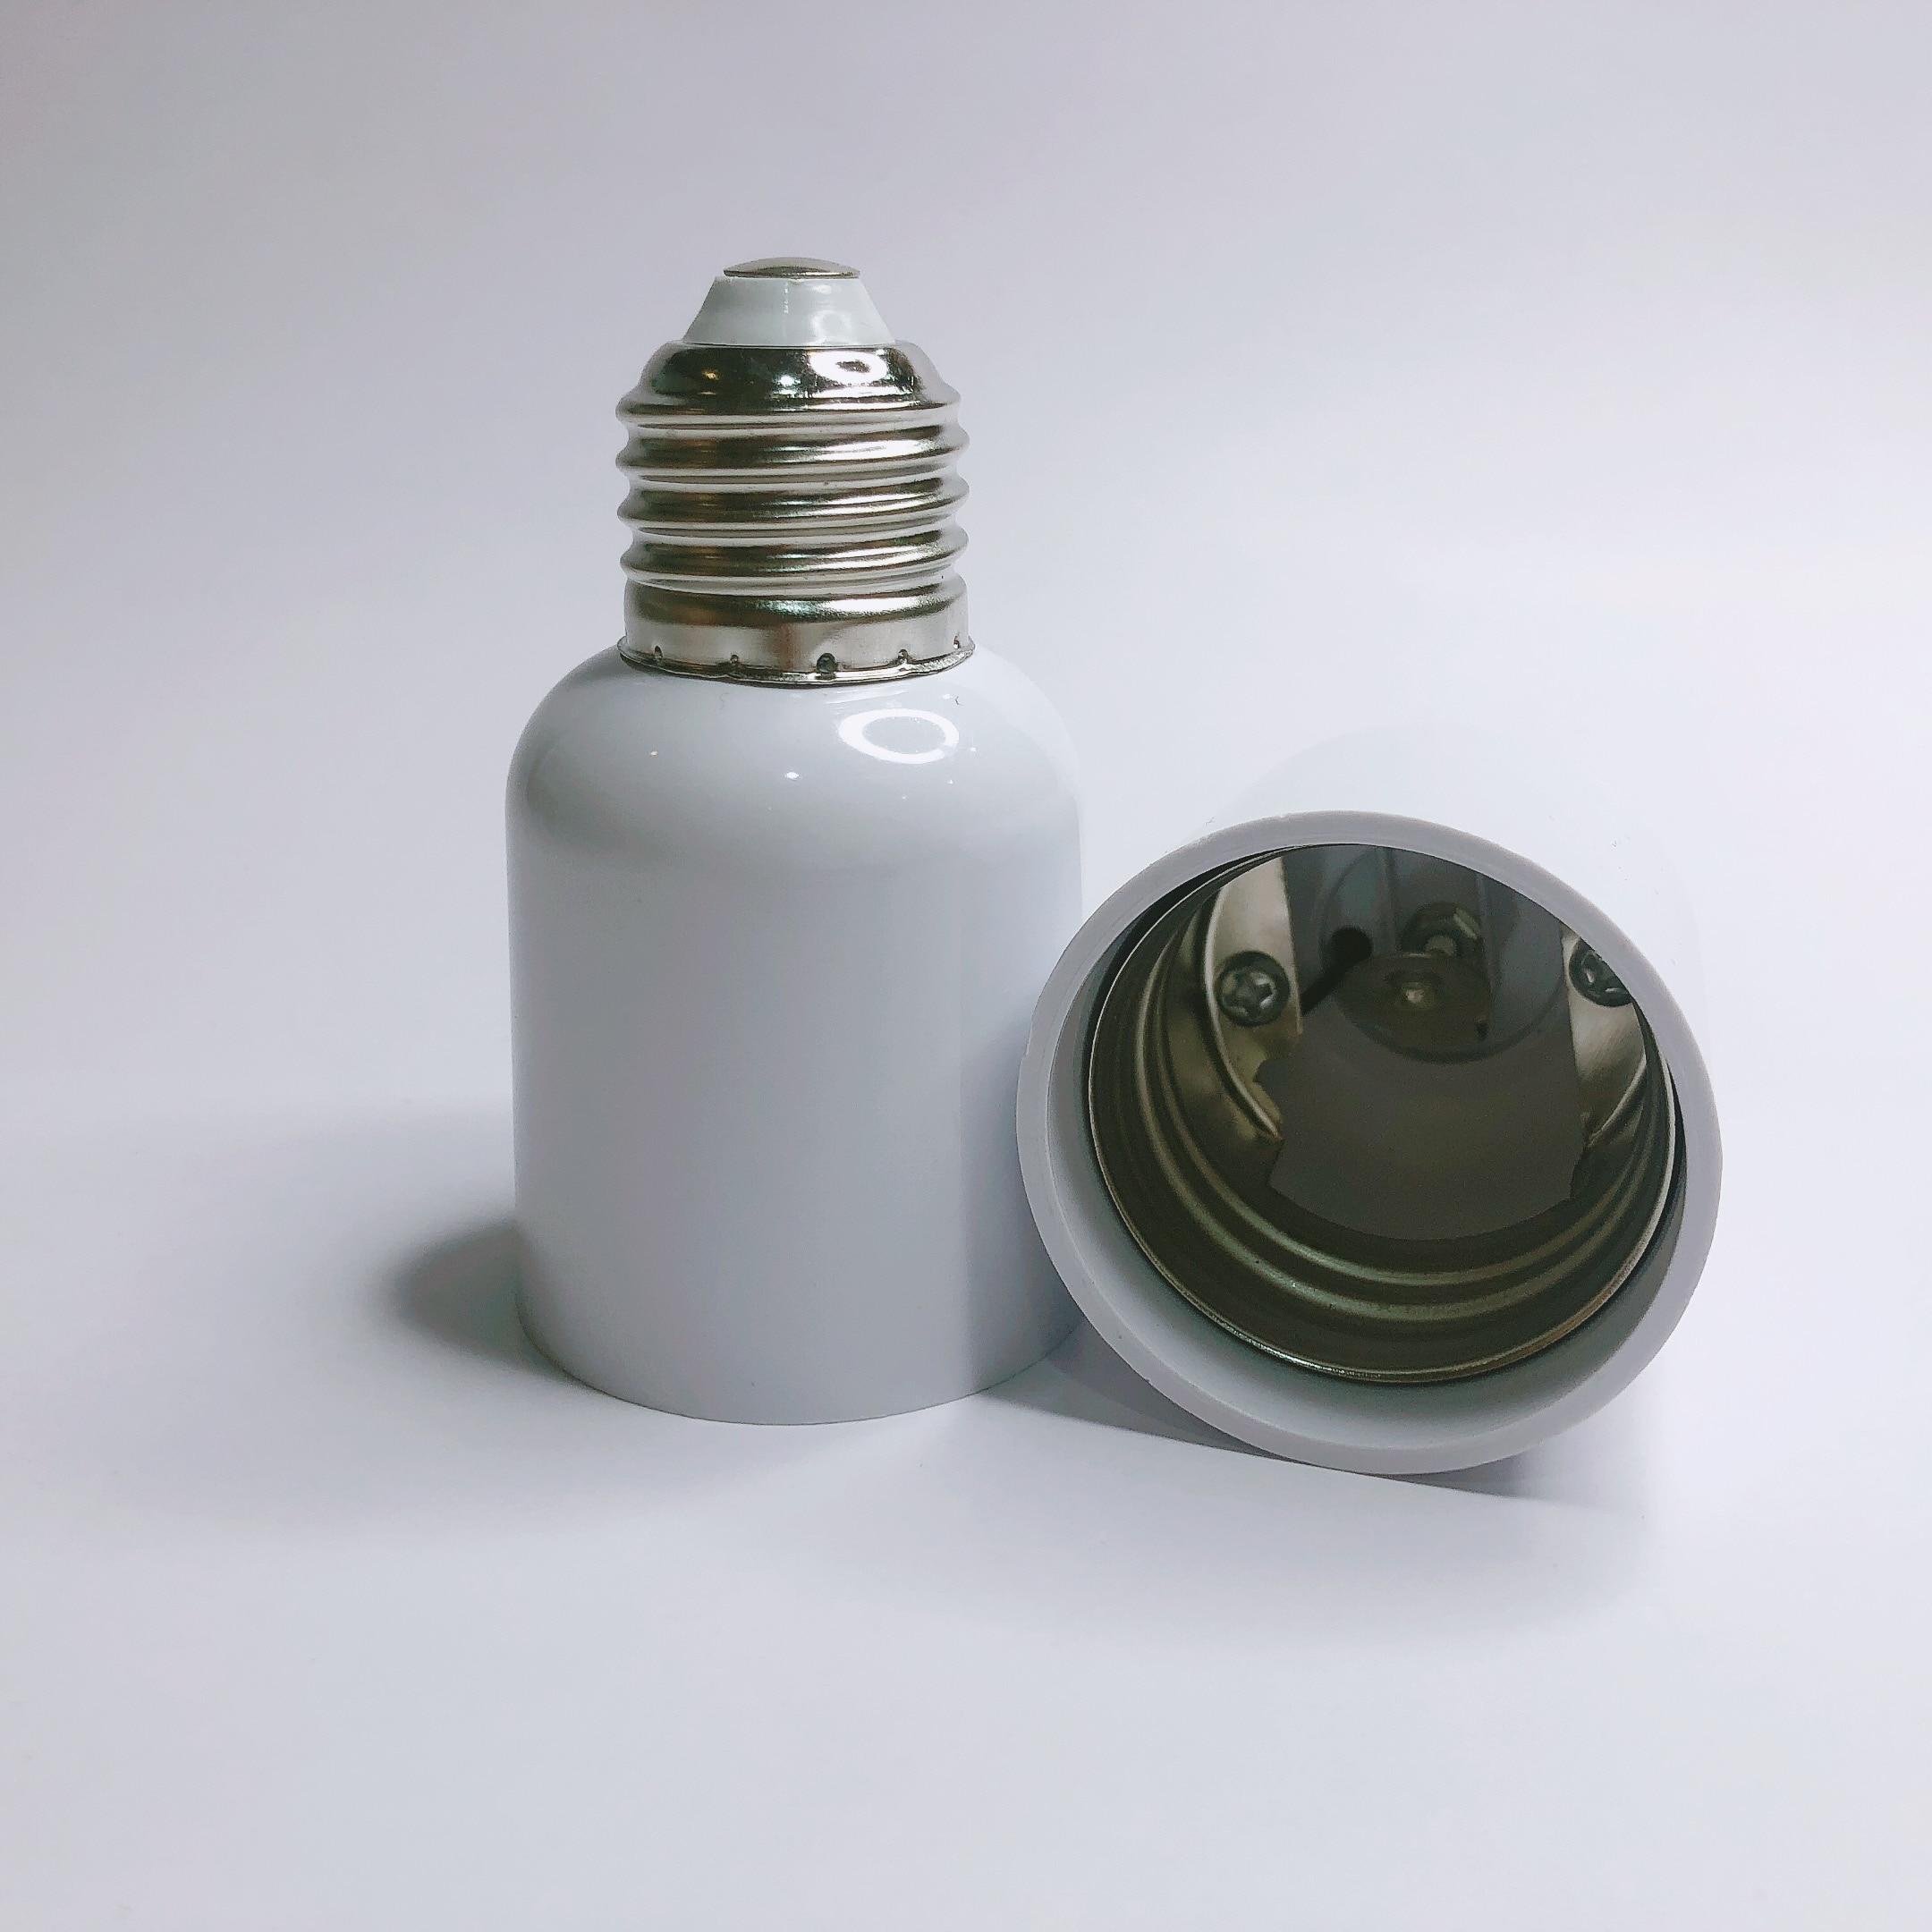 E27 To E40 Accessories Led Socket Heat Resistant Adapter Lightweight Home Bulb Screw Base Lamp Holder Converter